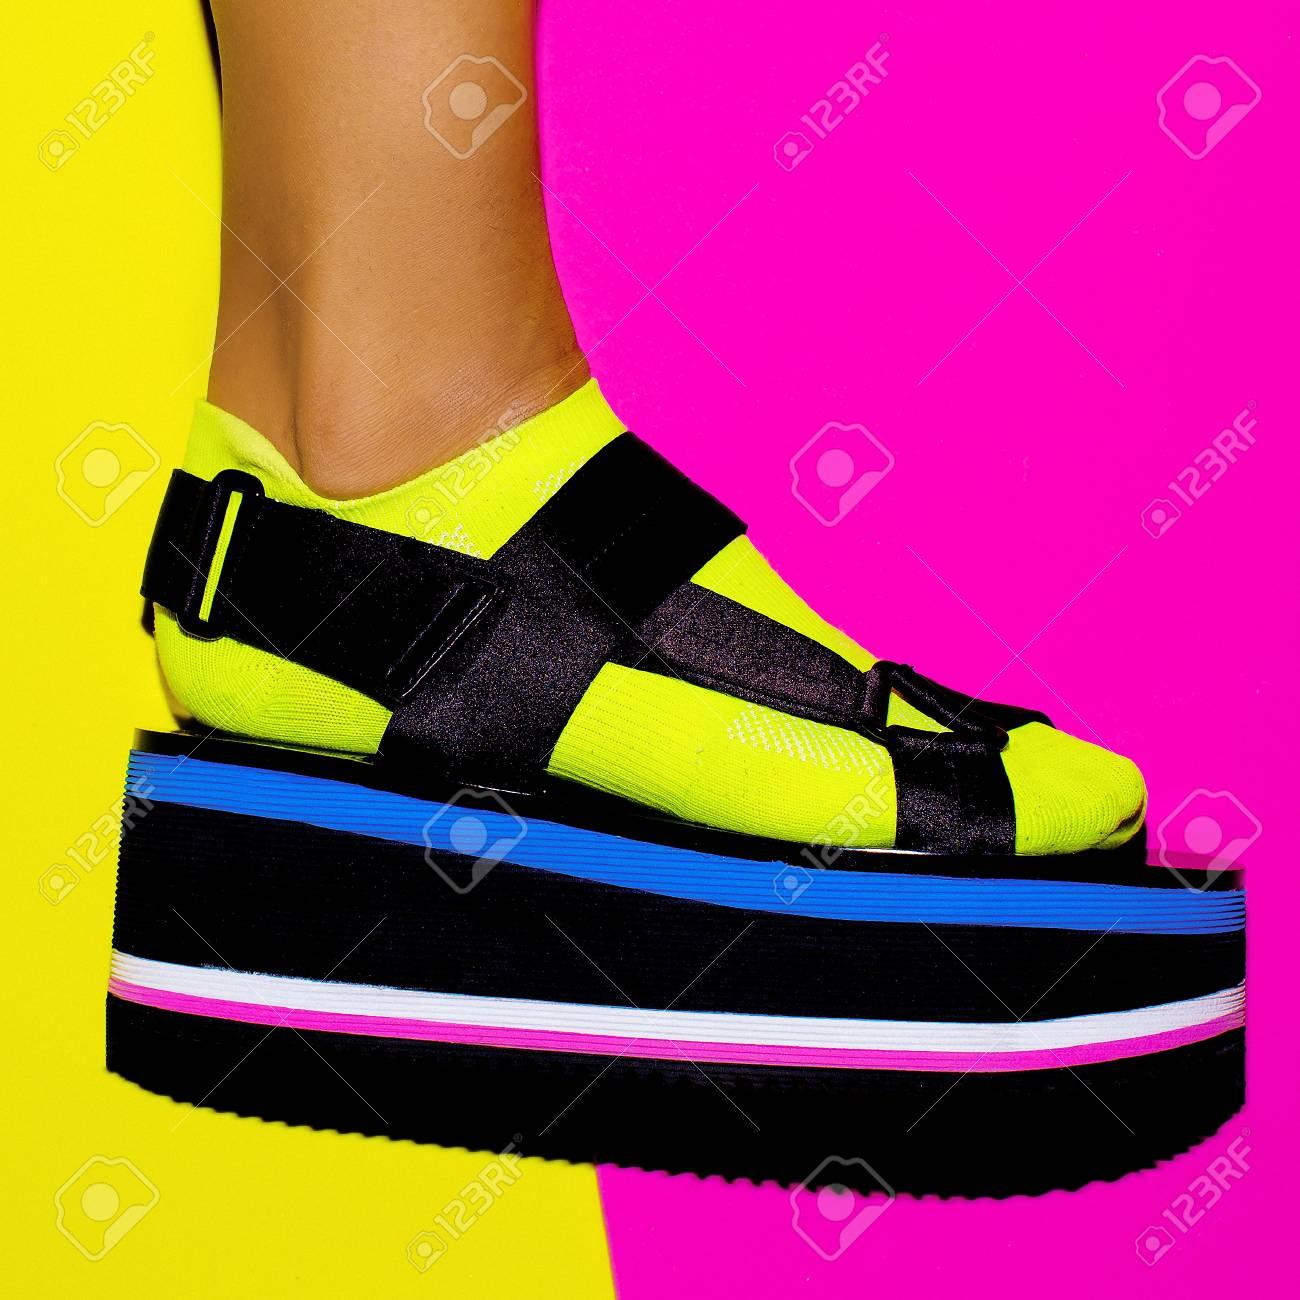 Platform Trend. Stylish Shoes For Girls